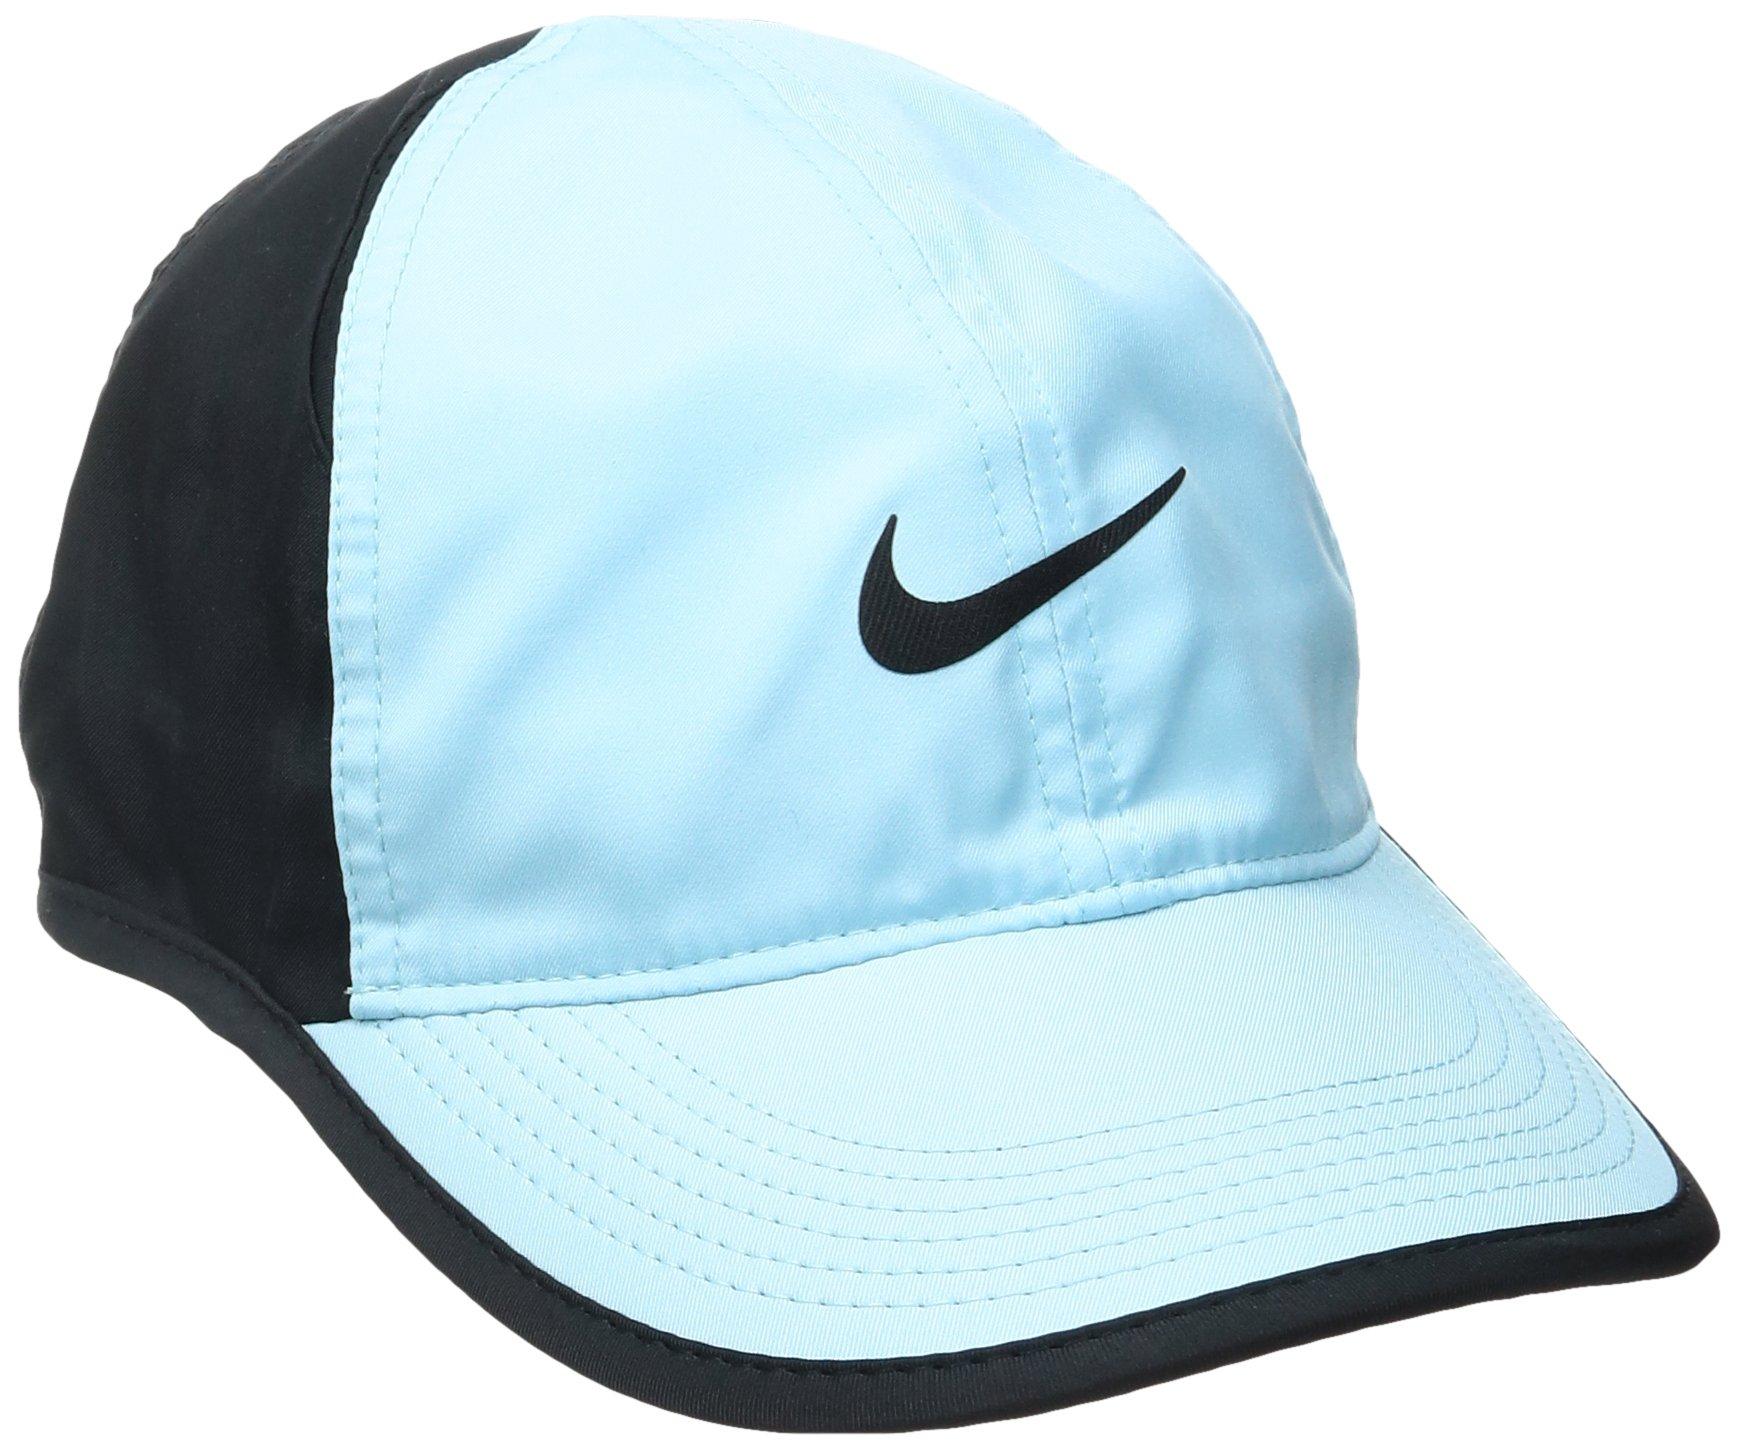 Nike Womens Featherlight Hat (Still Blue, One Size)